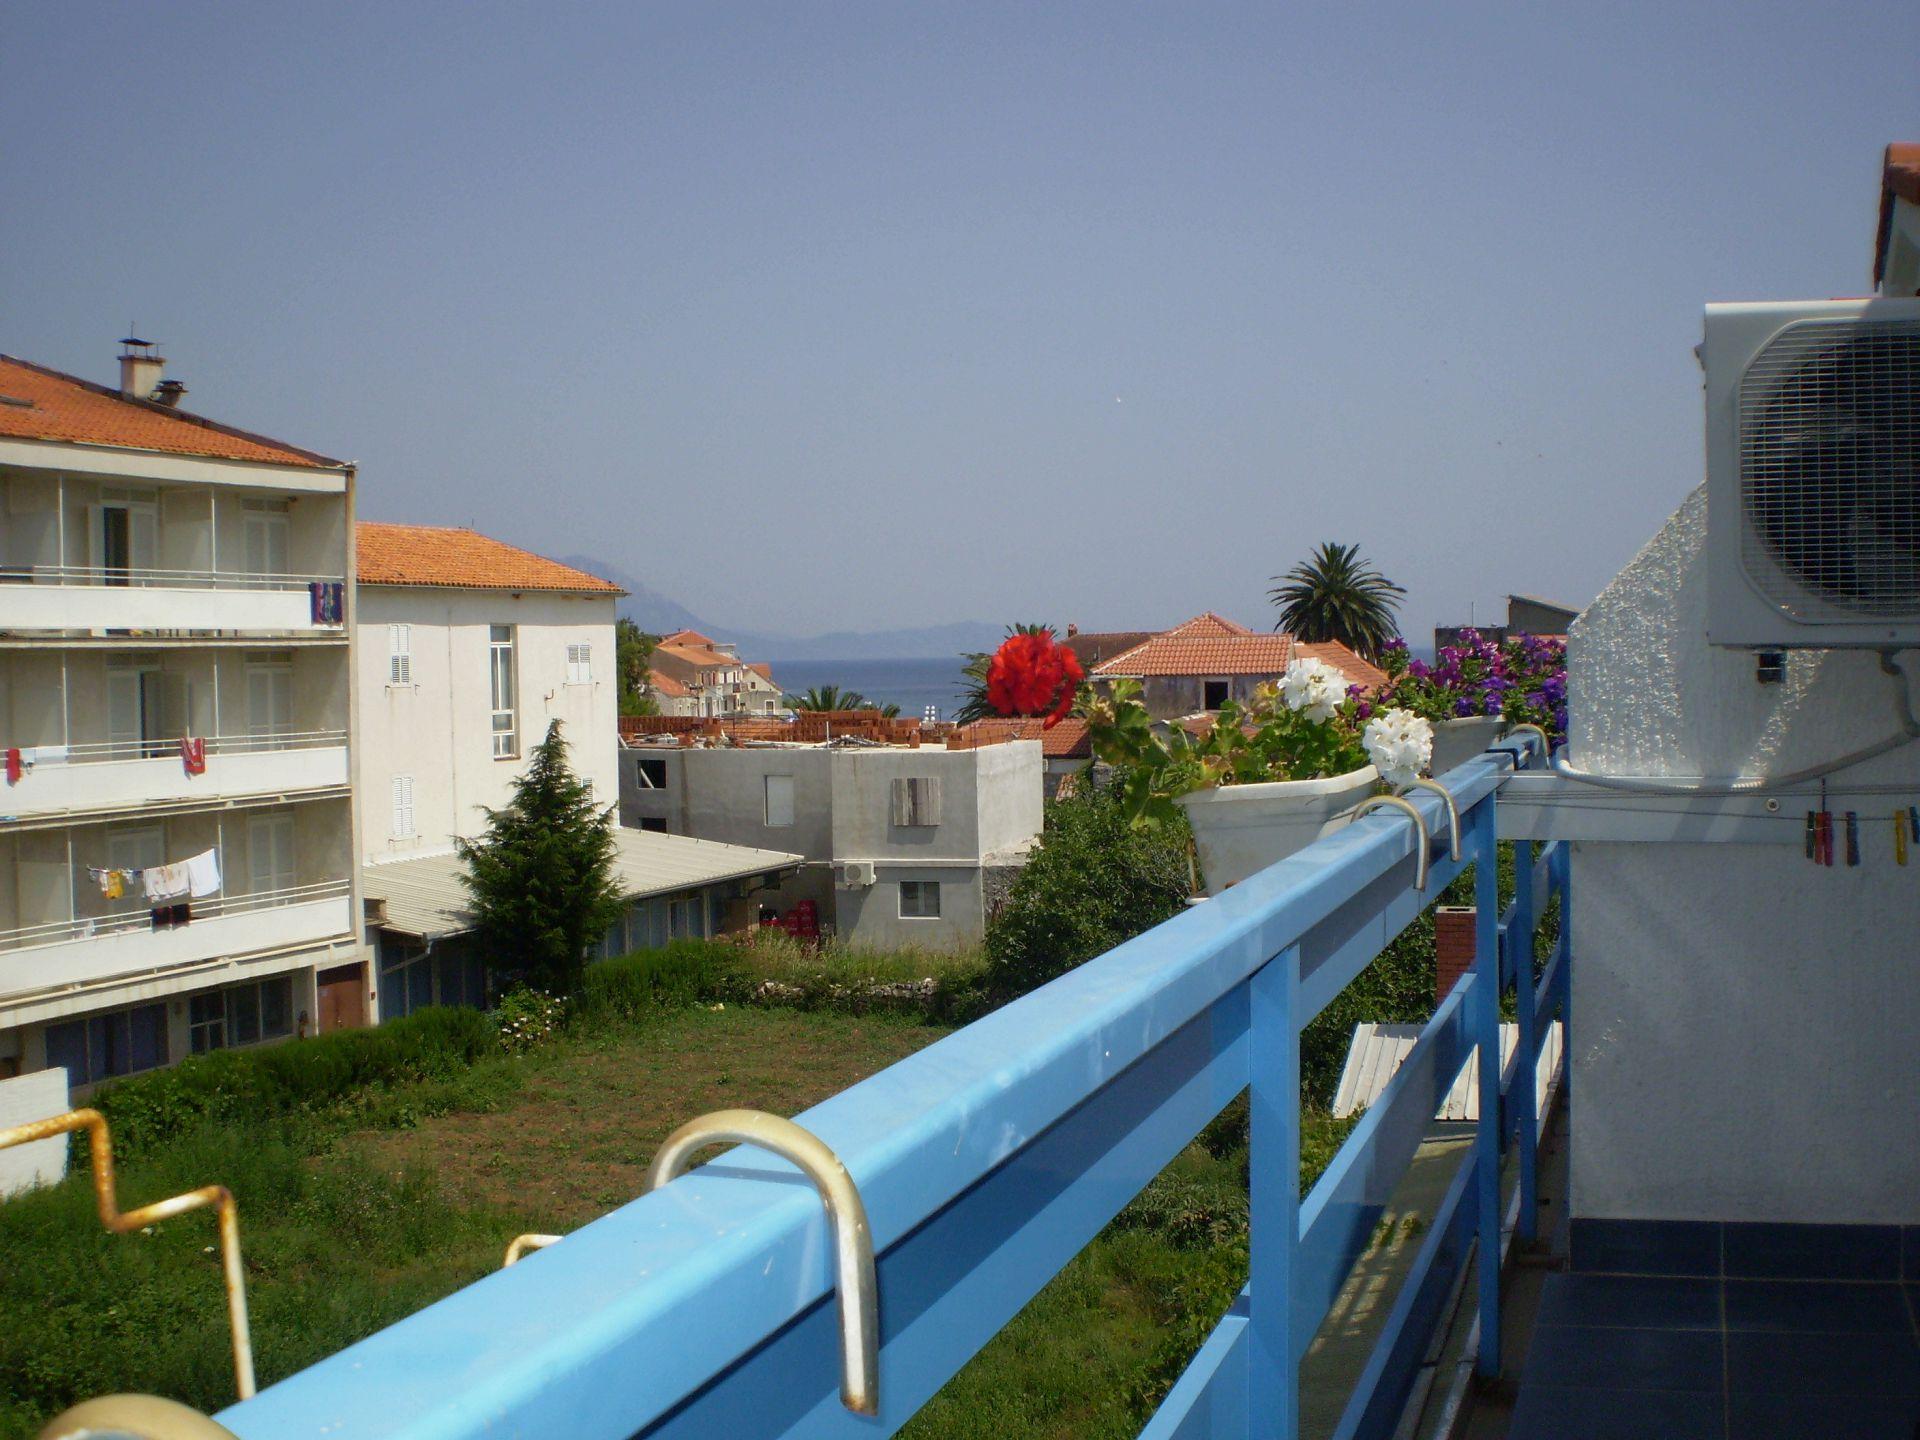 003SUCU  - Sucuraj - Appartementen Kroatië - SA13(3): uitzicht vanaf balkon